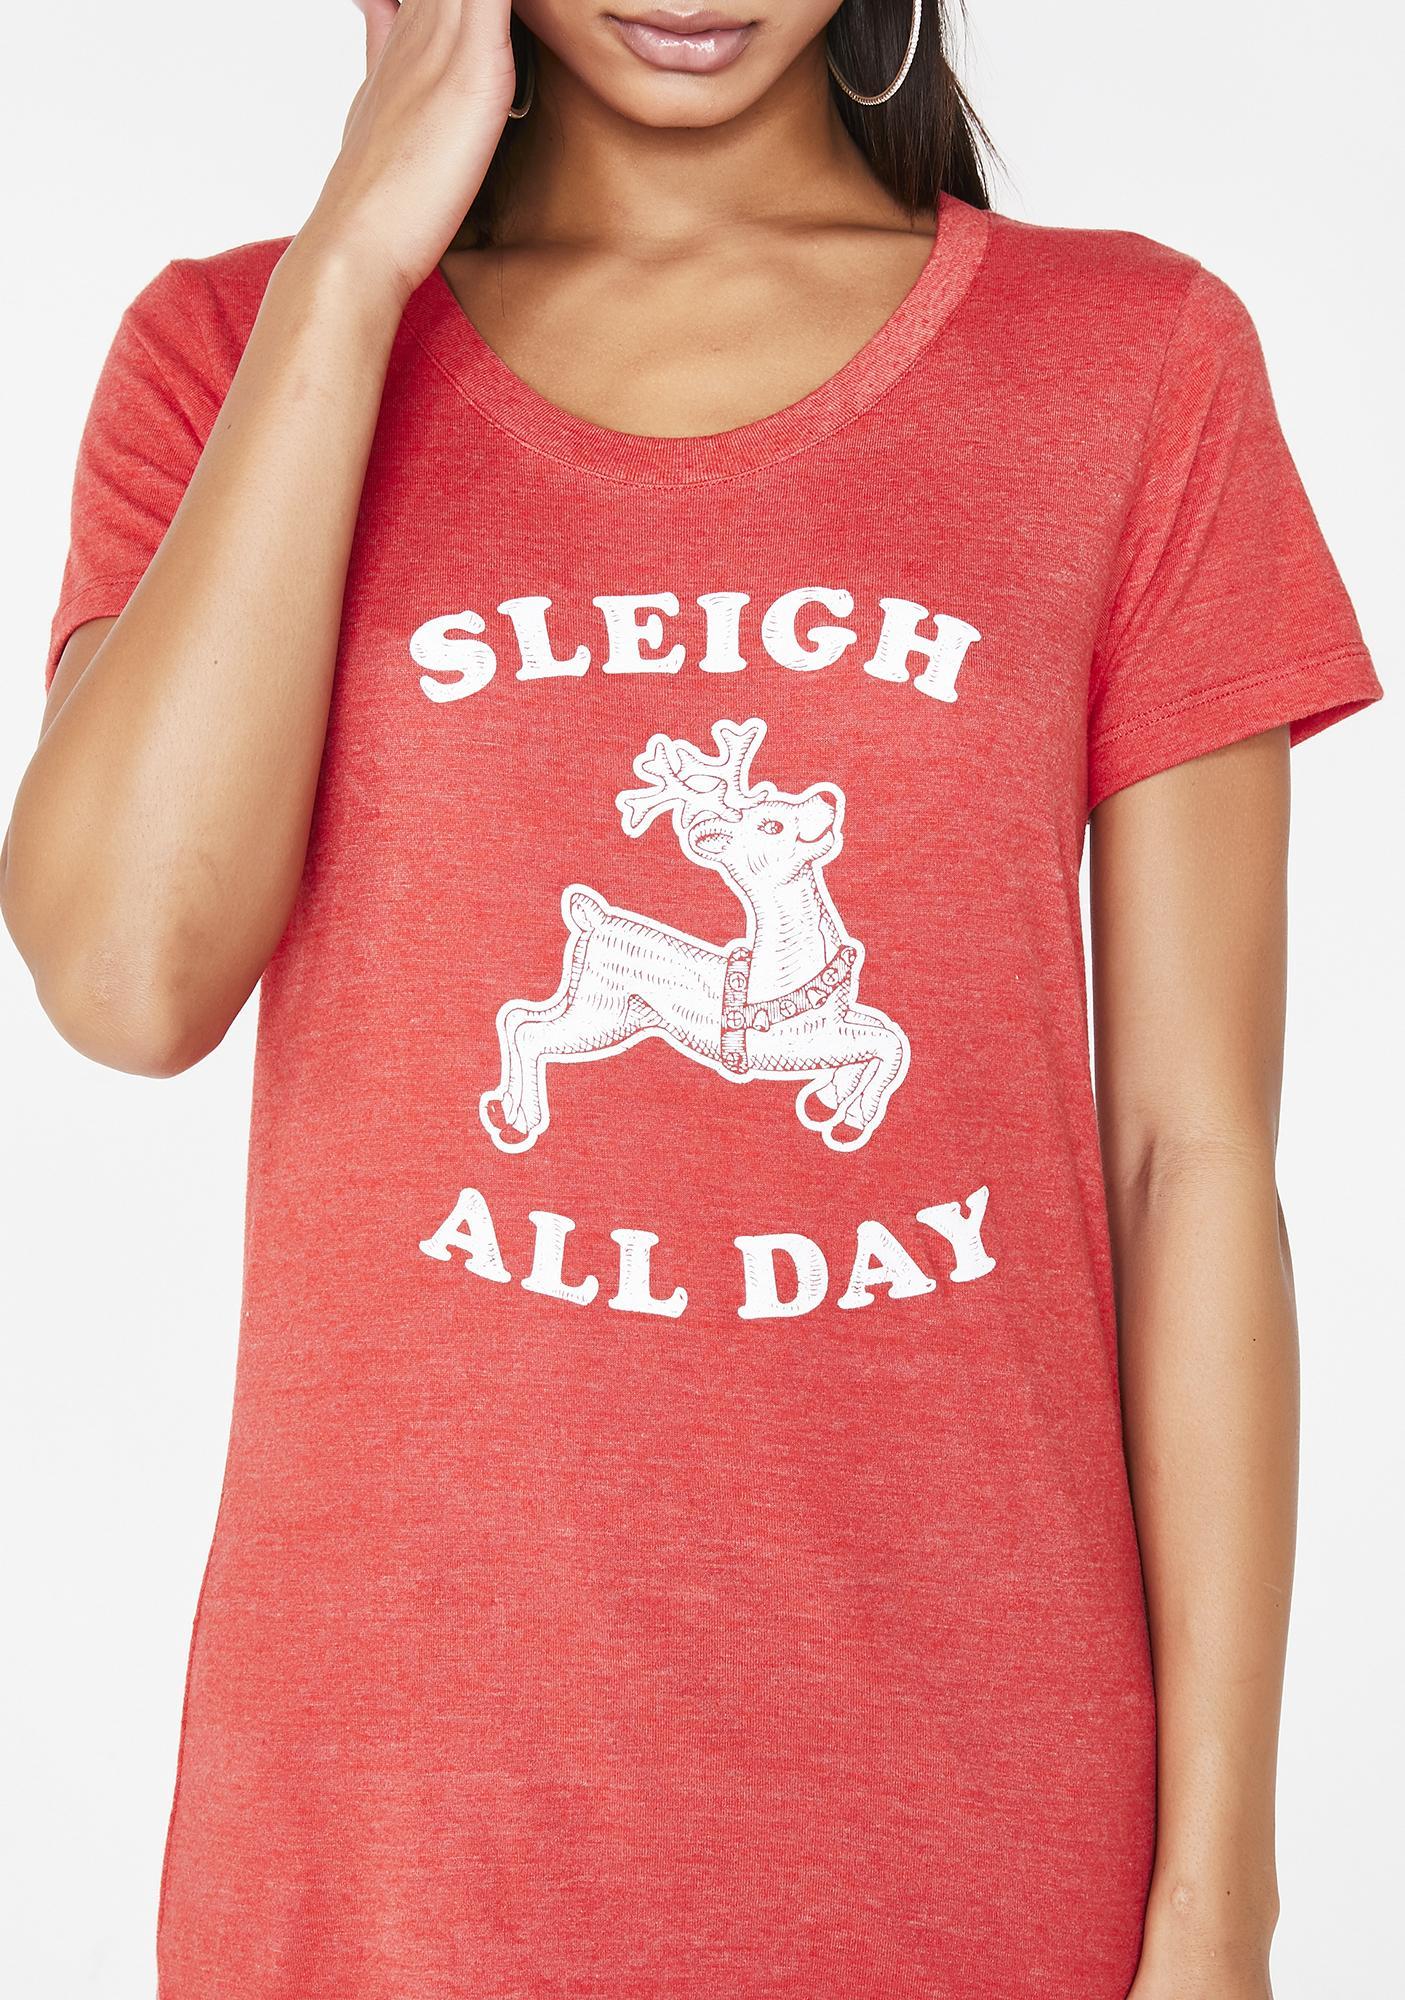 Tipsy Elves Sleigh All Day Tee